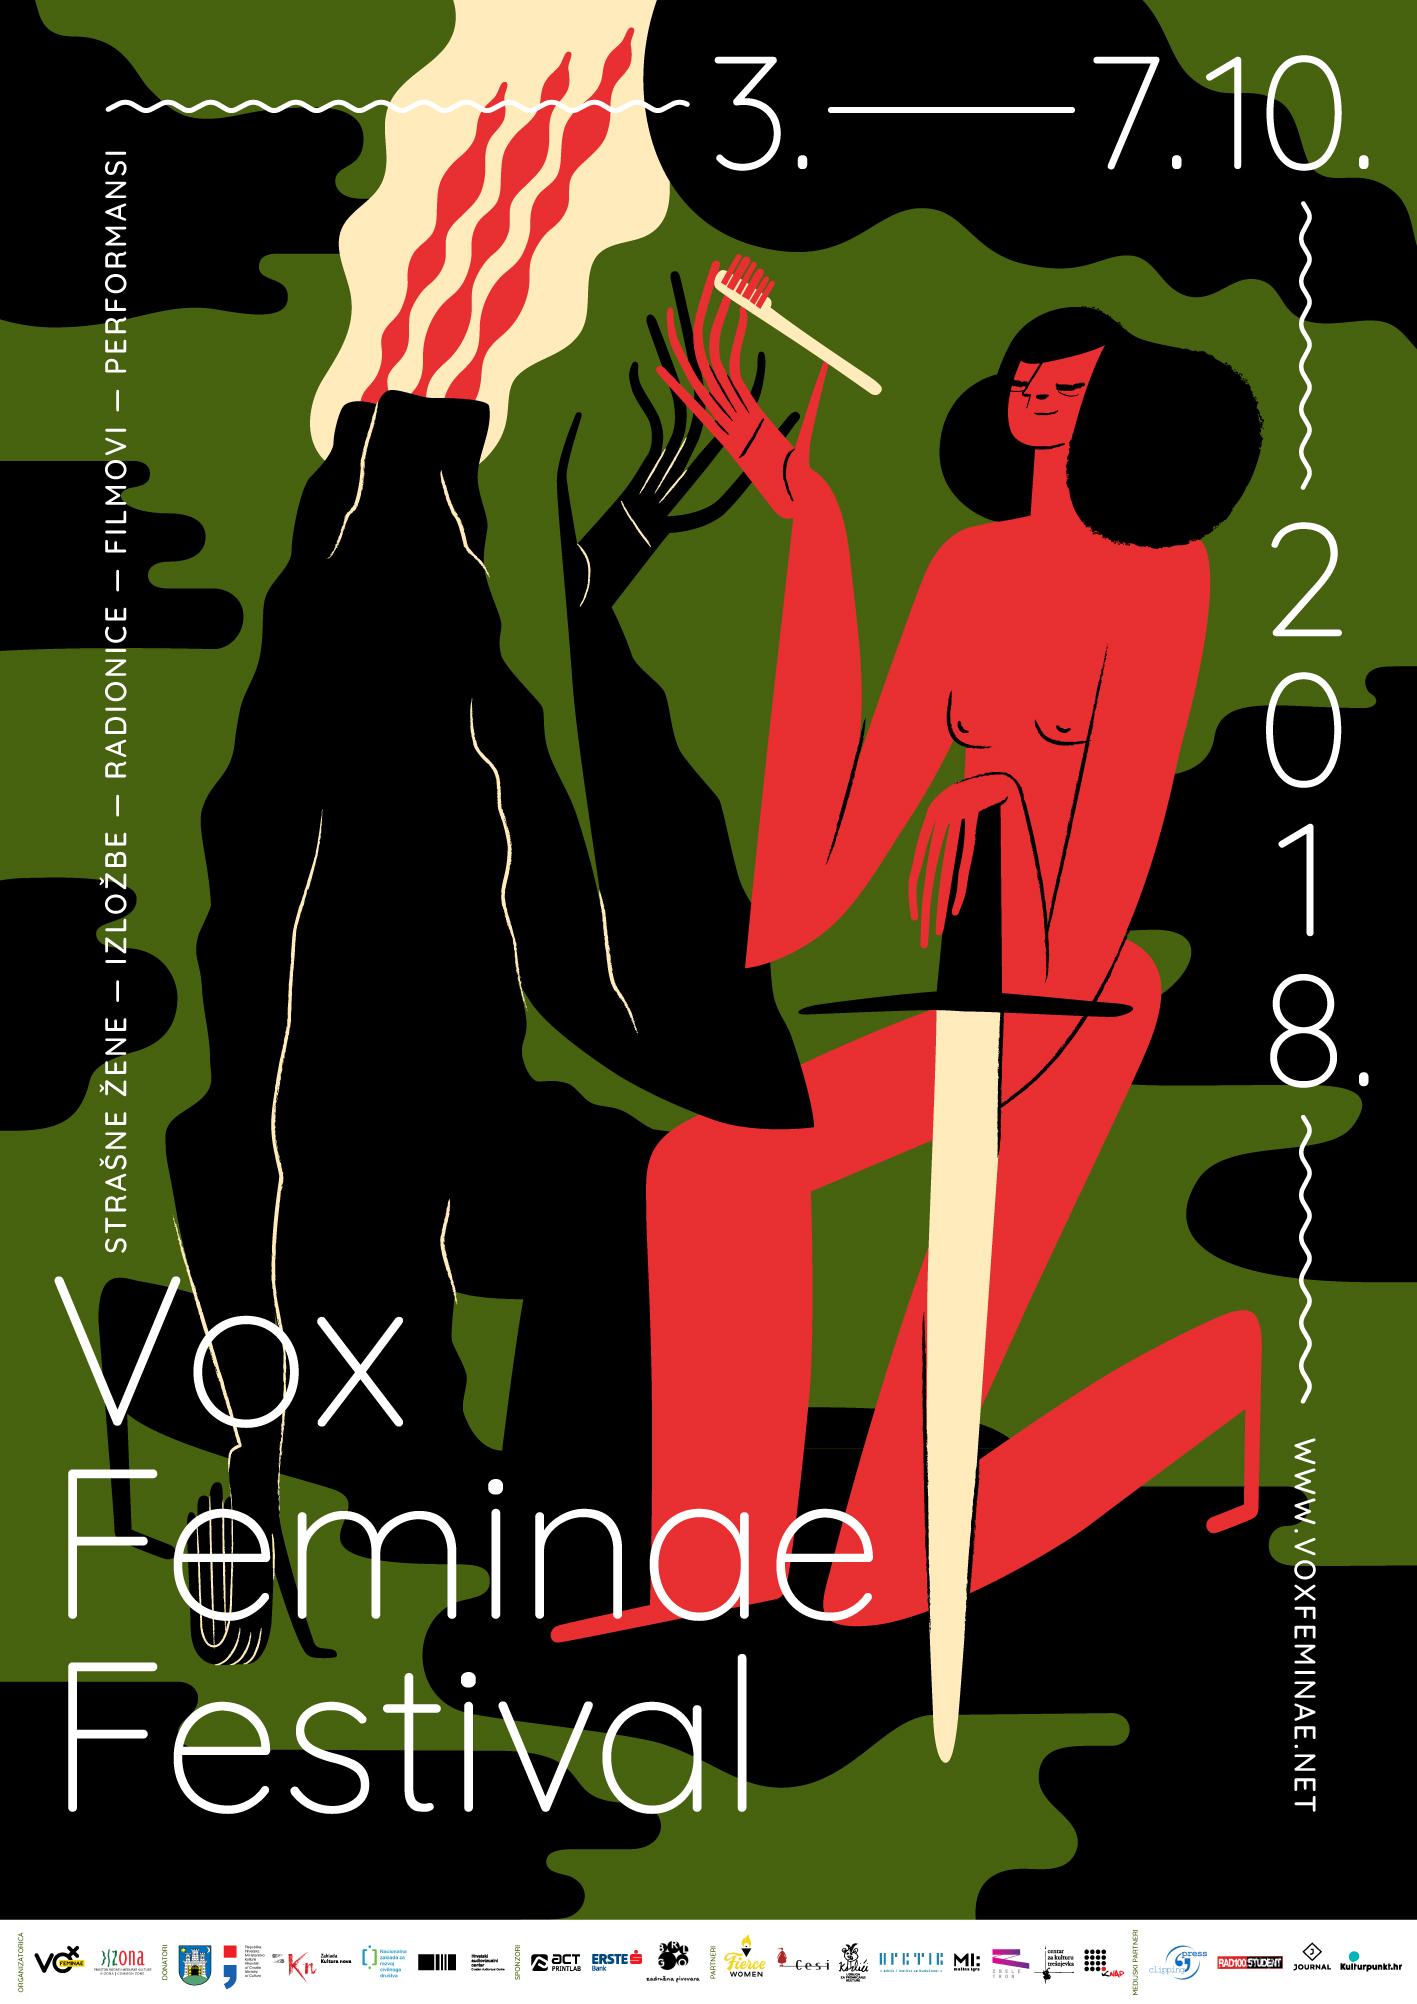 vox_feminae18